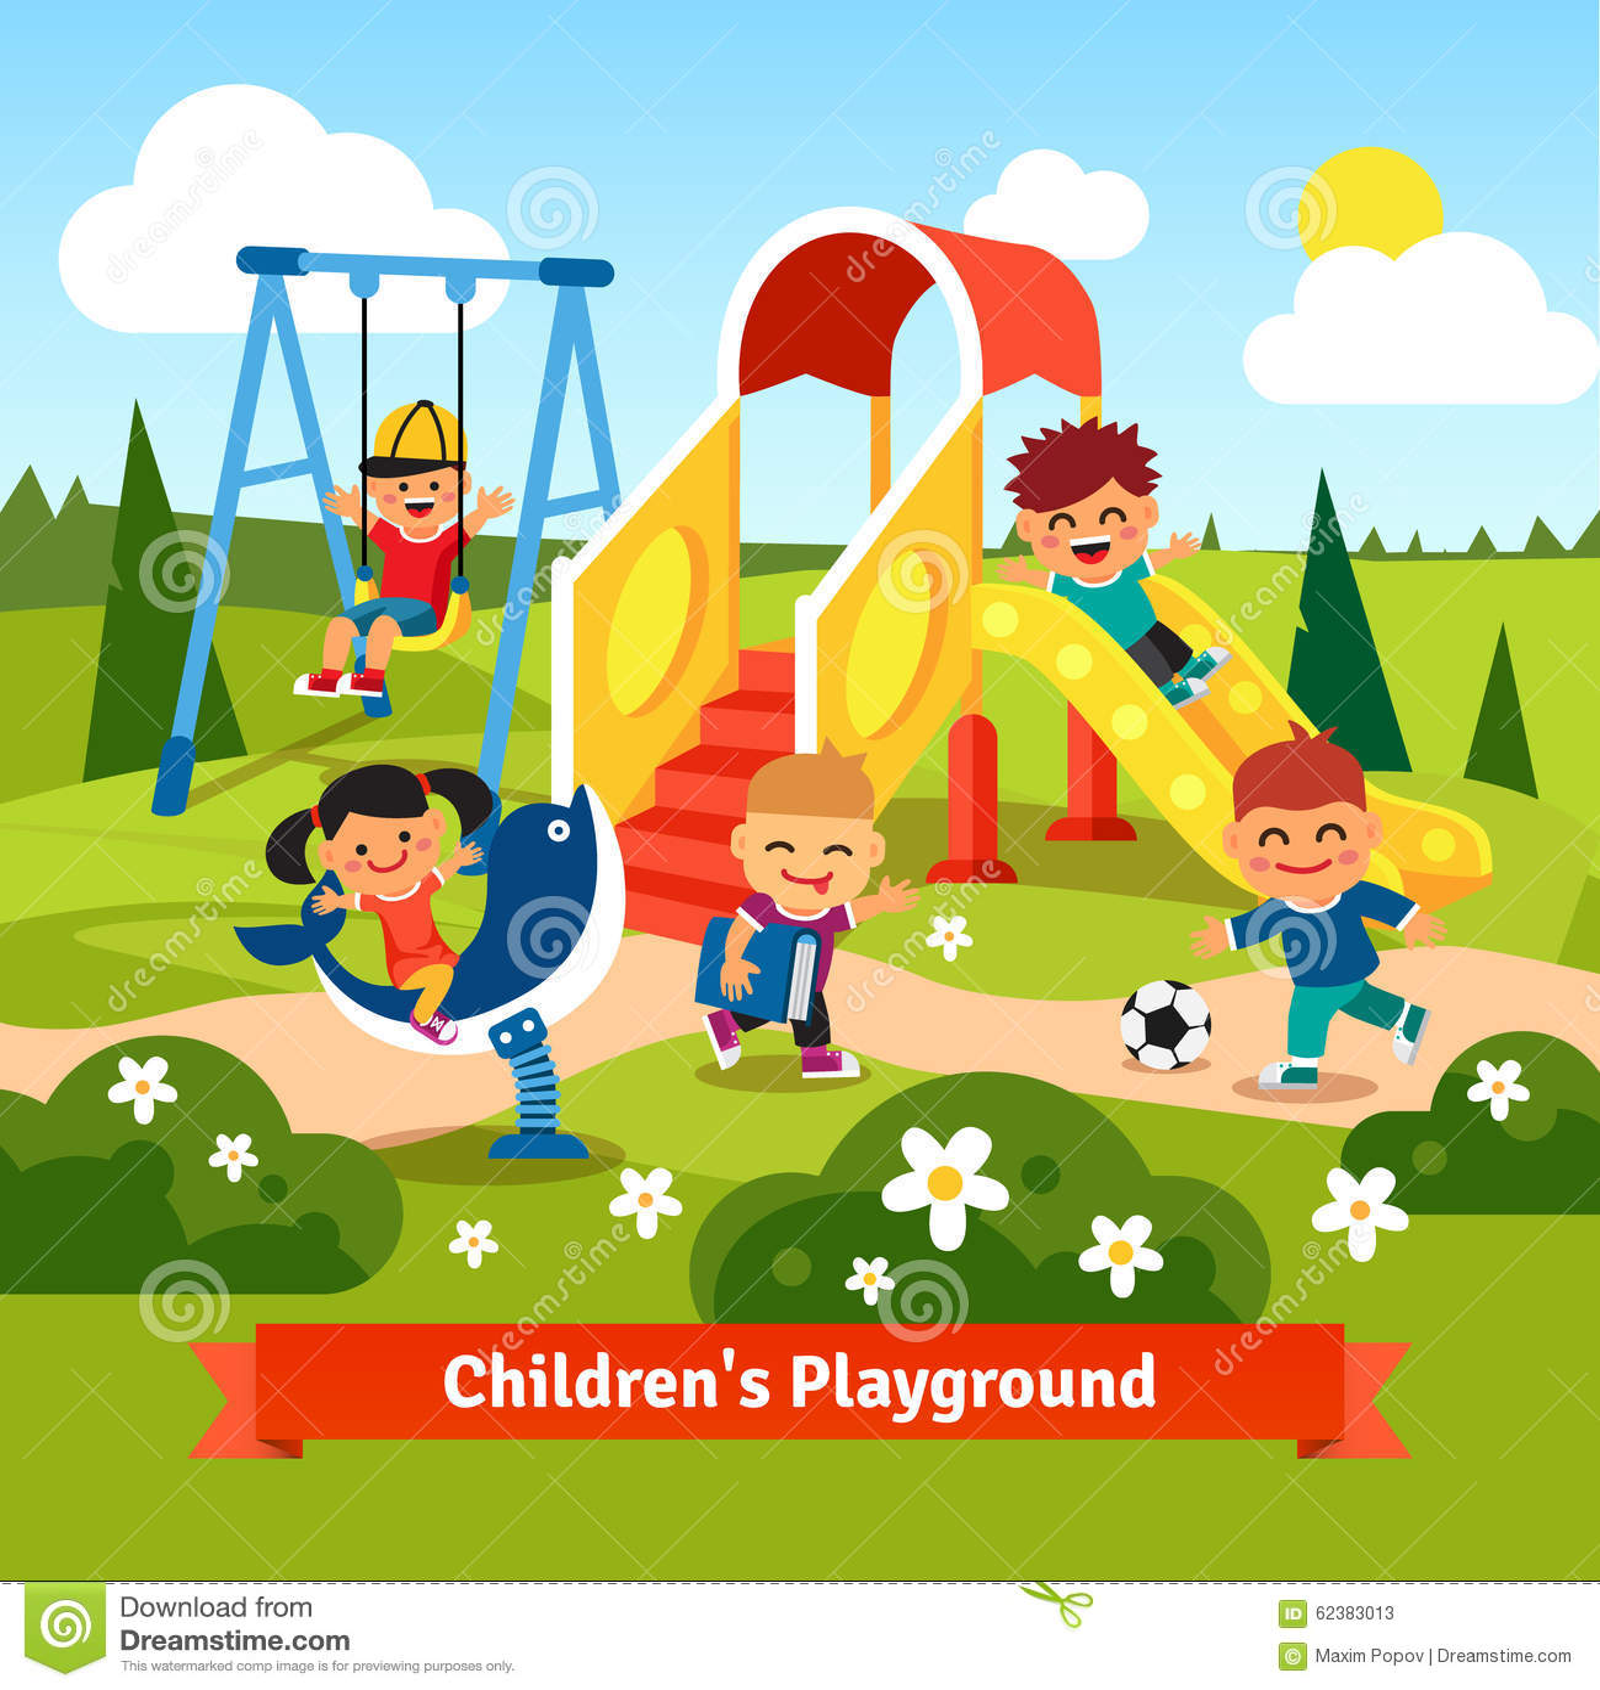 Kids Playing On Playground Swinging And Sliding Stock